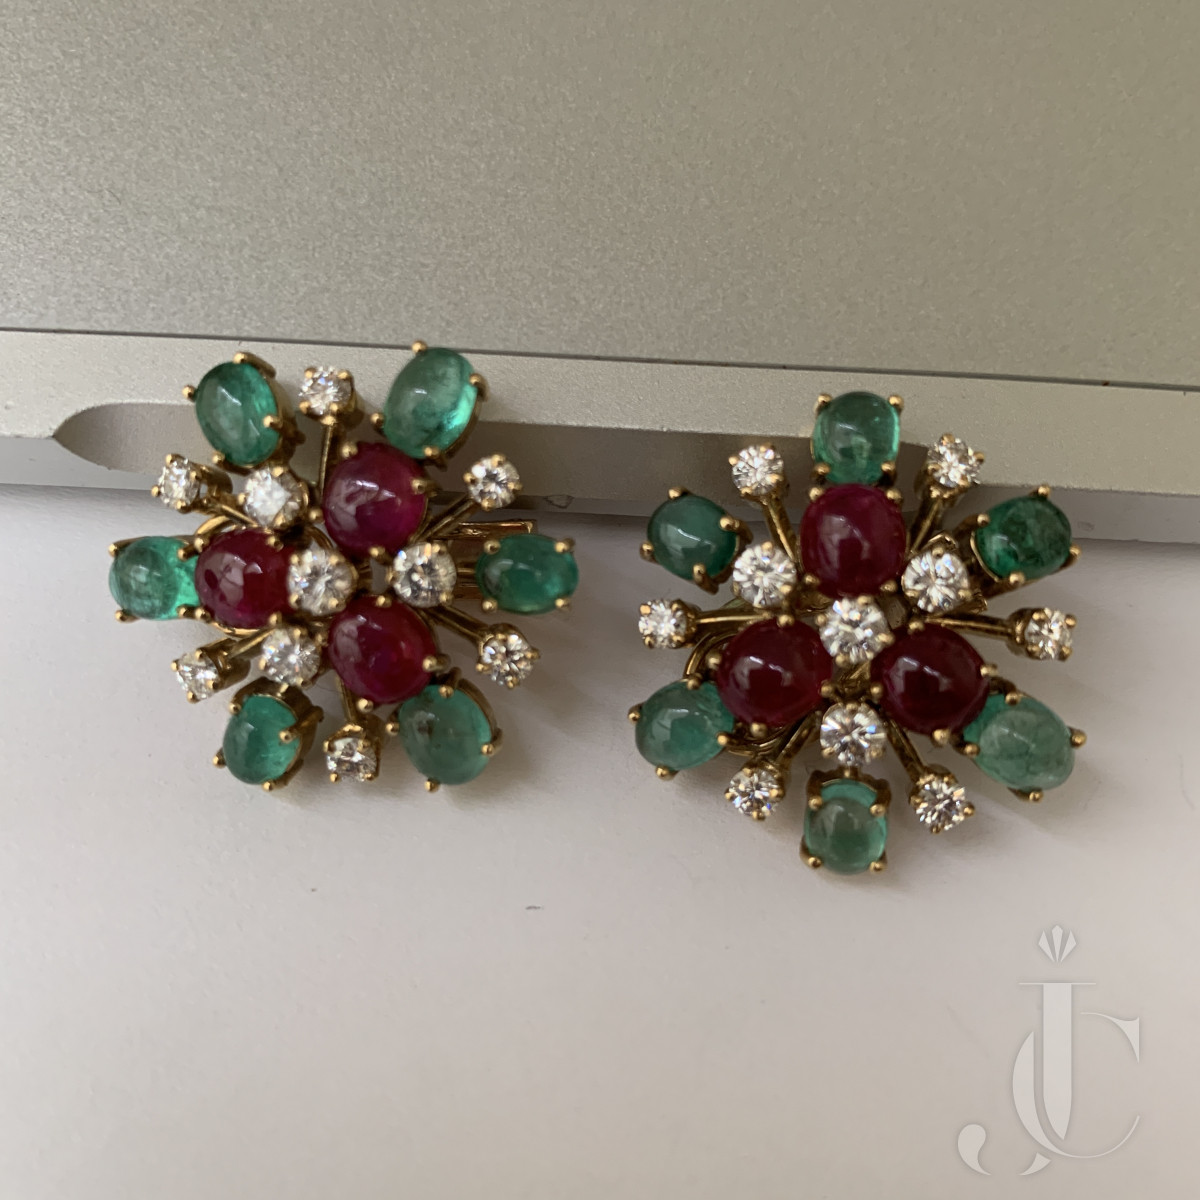 Bvlgari ruby , emerald and diamond earrings C1960